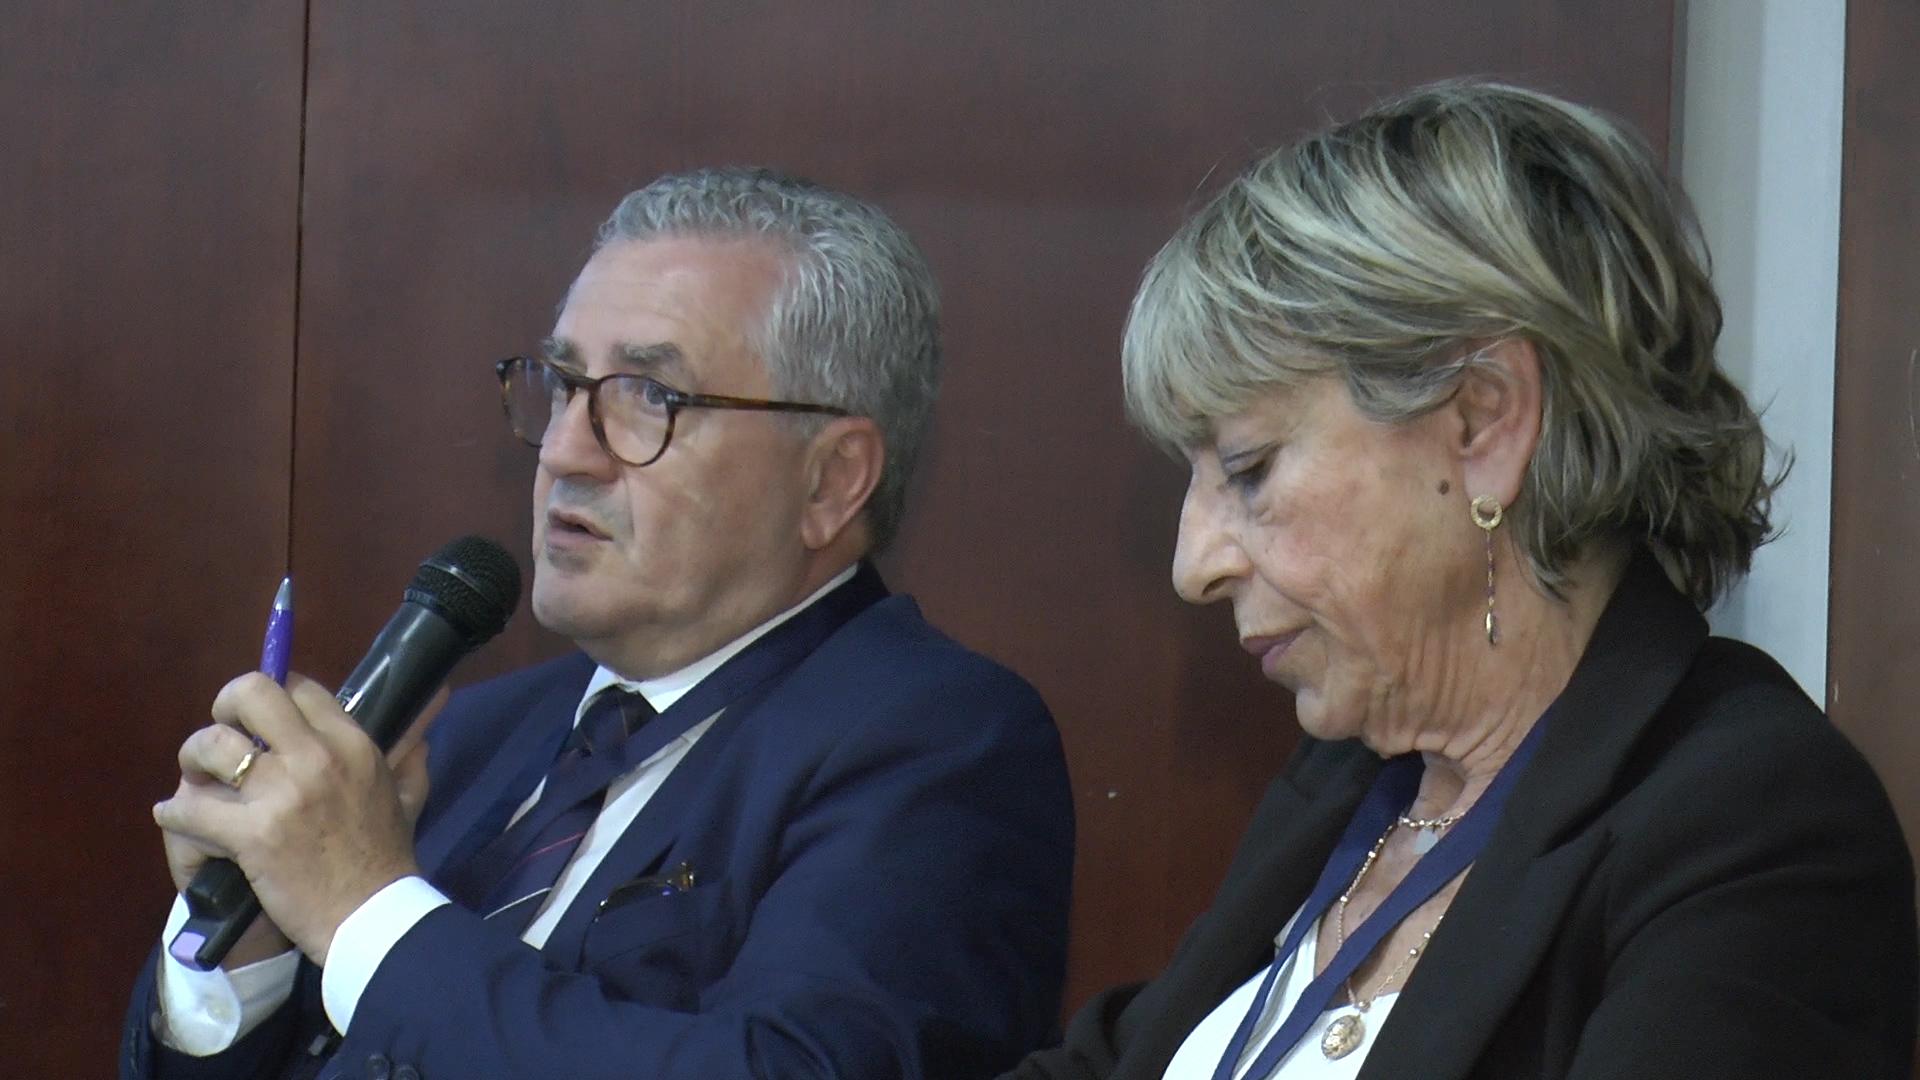 dott.ri Mario Bentivegna e Elisabetta Battaglia